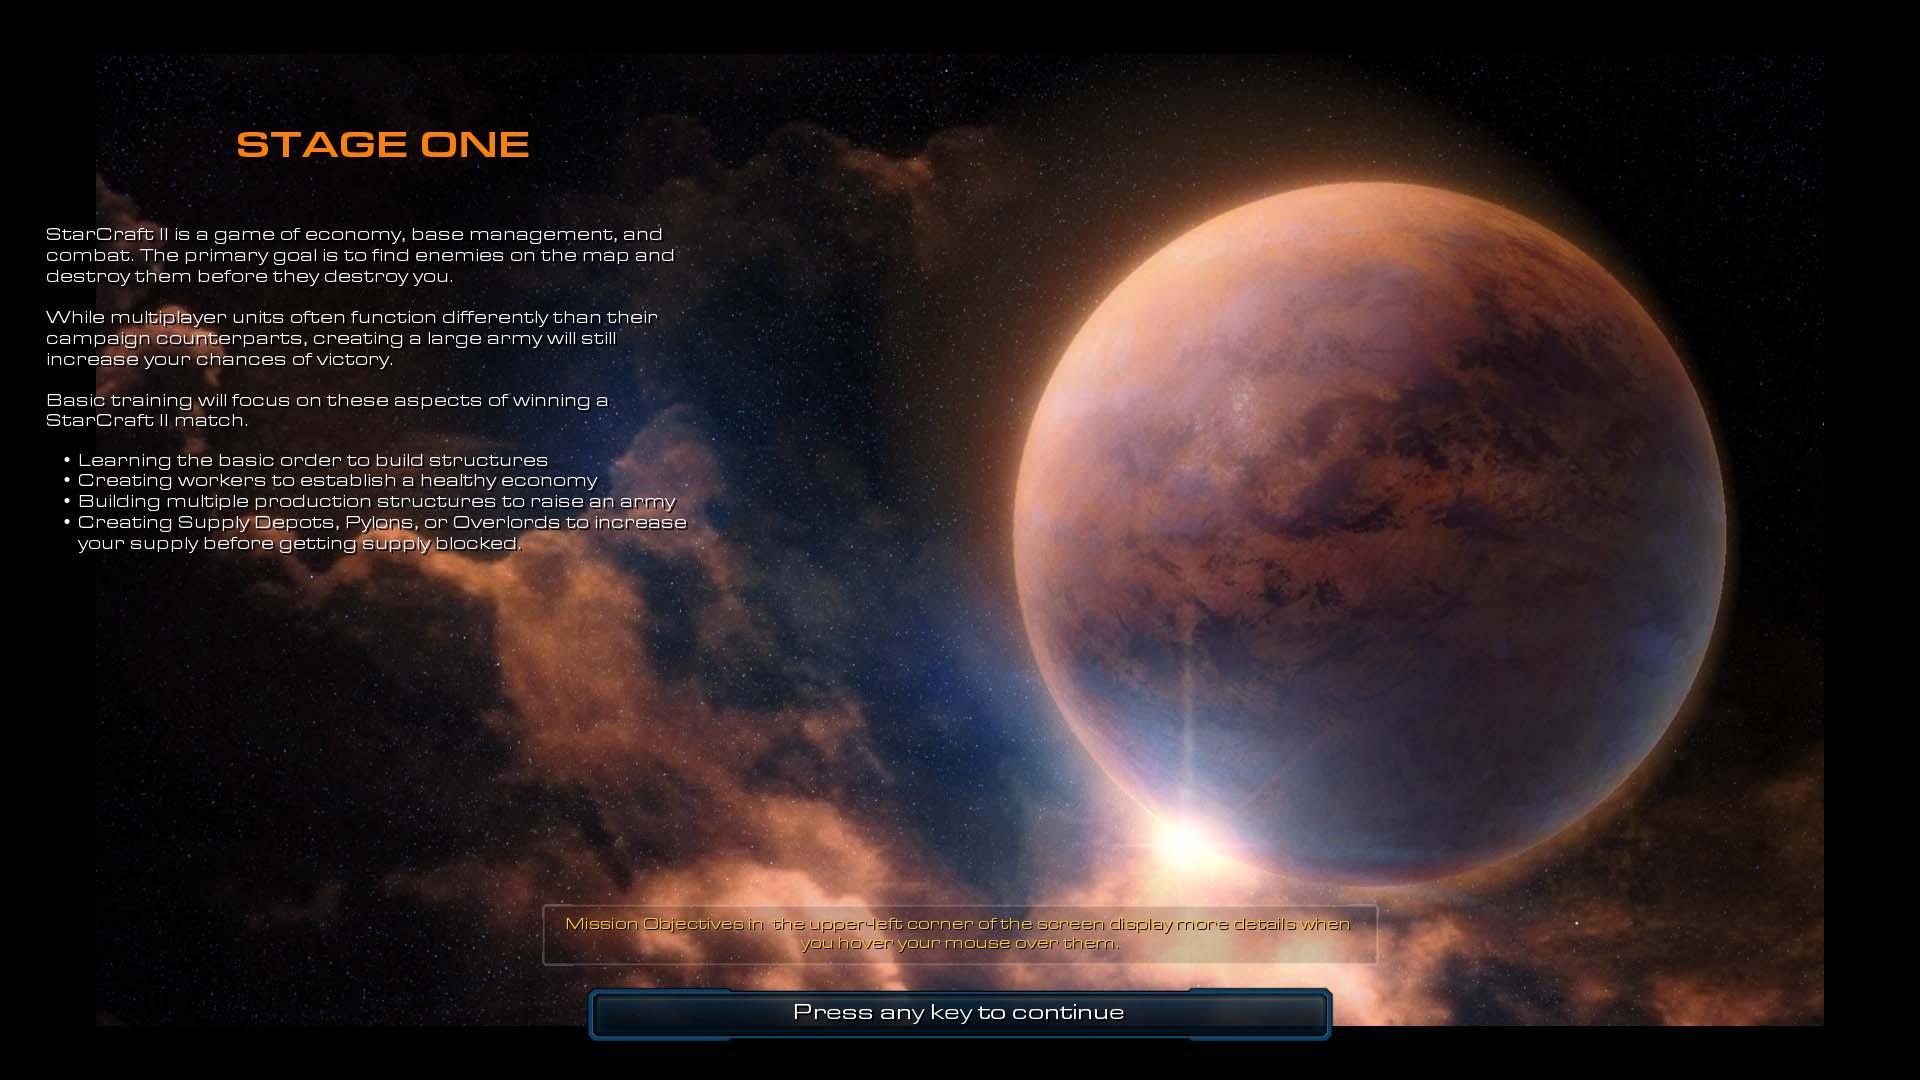 Starcraft image: Blizzard Entertainment